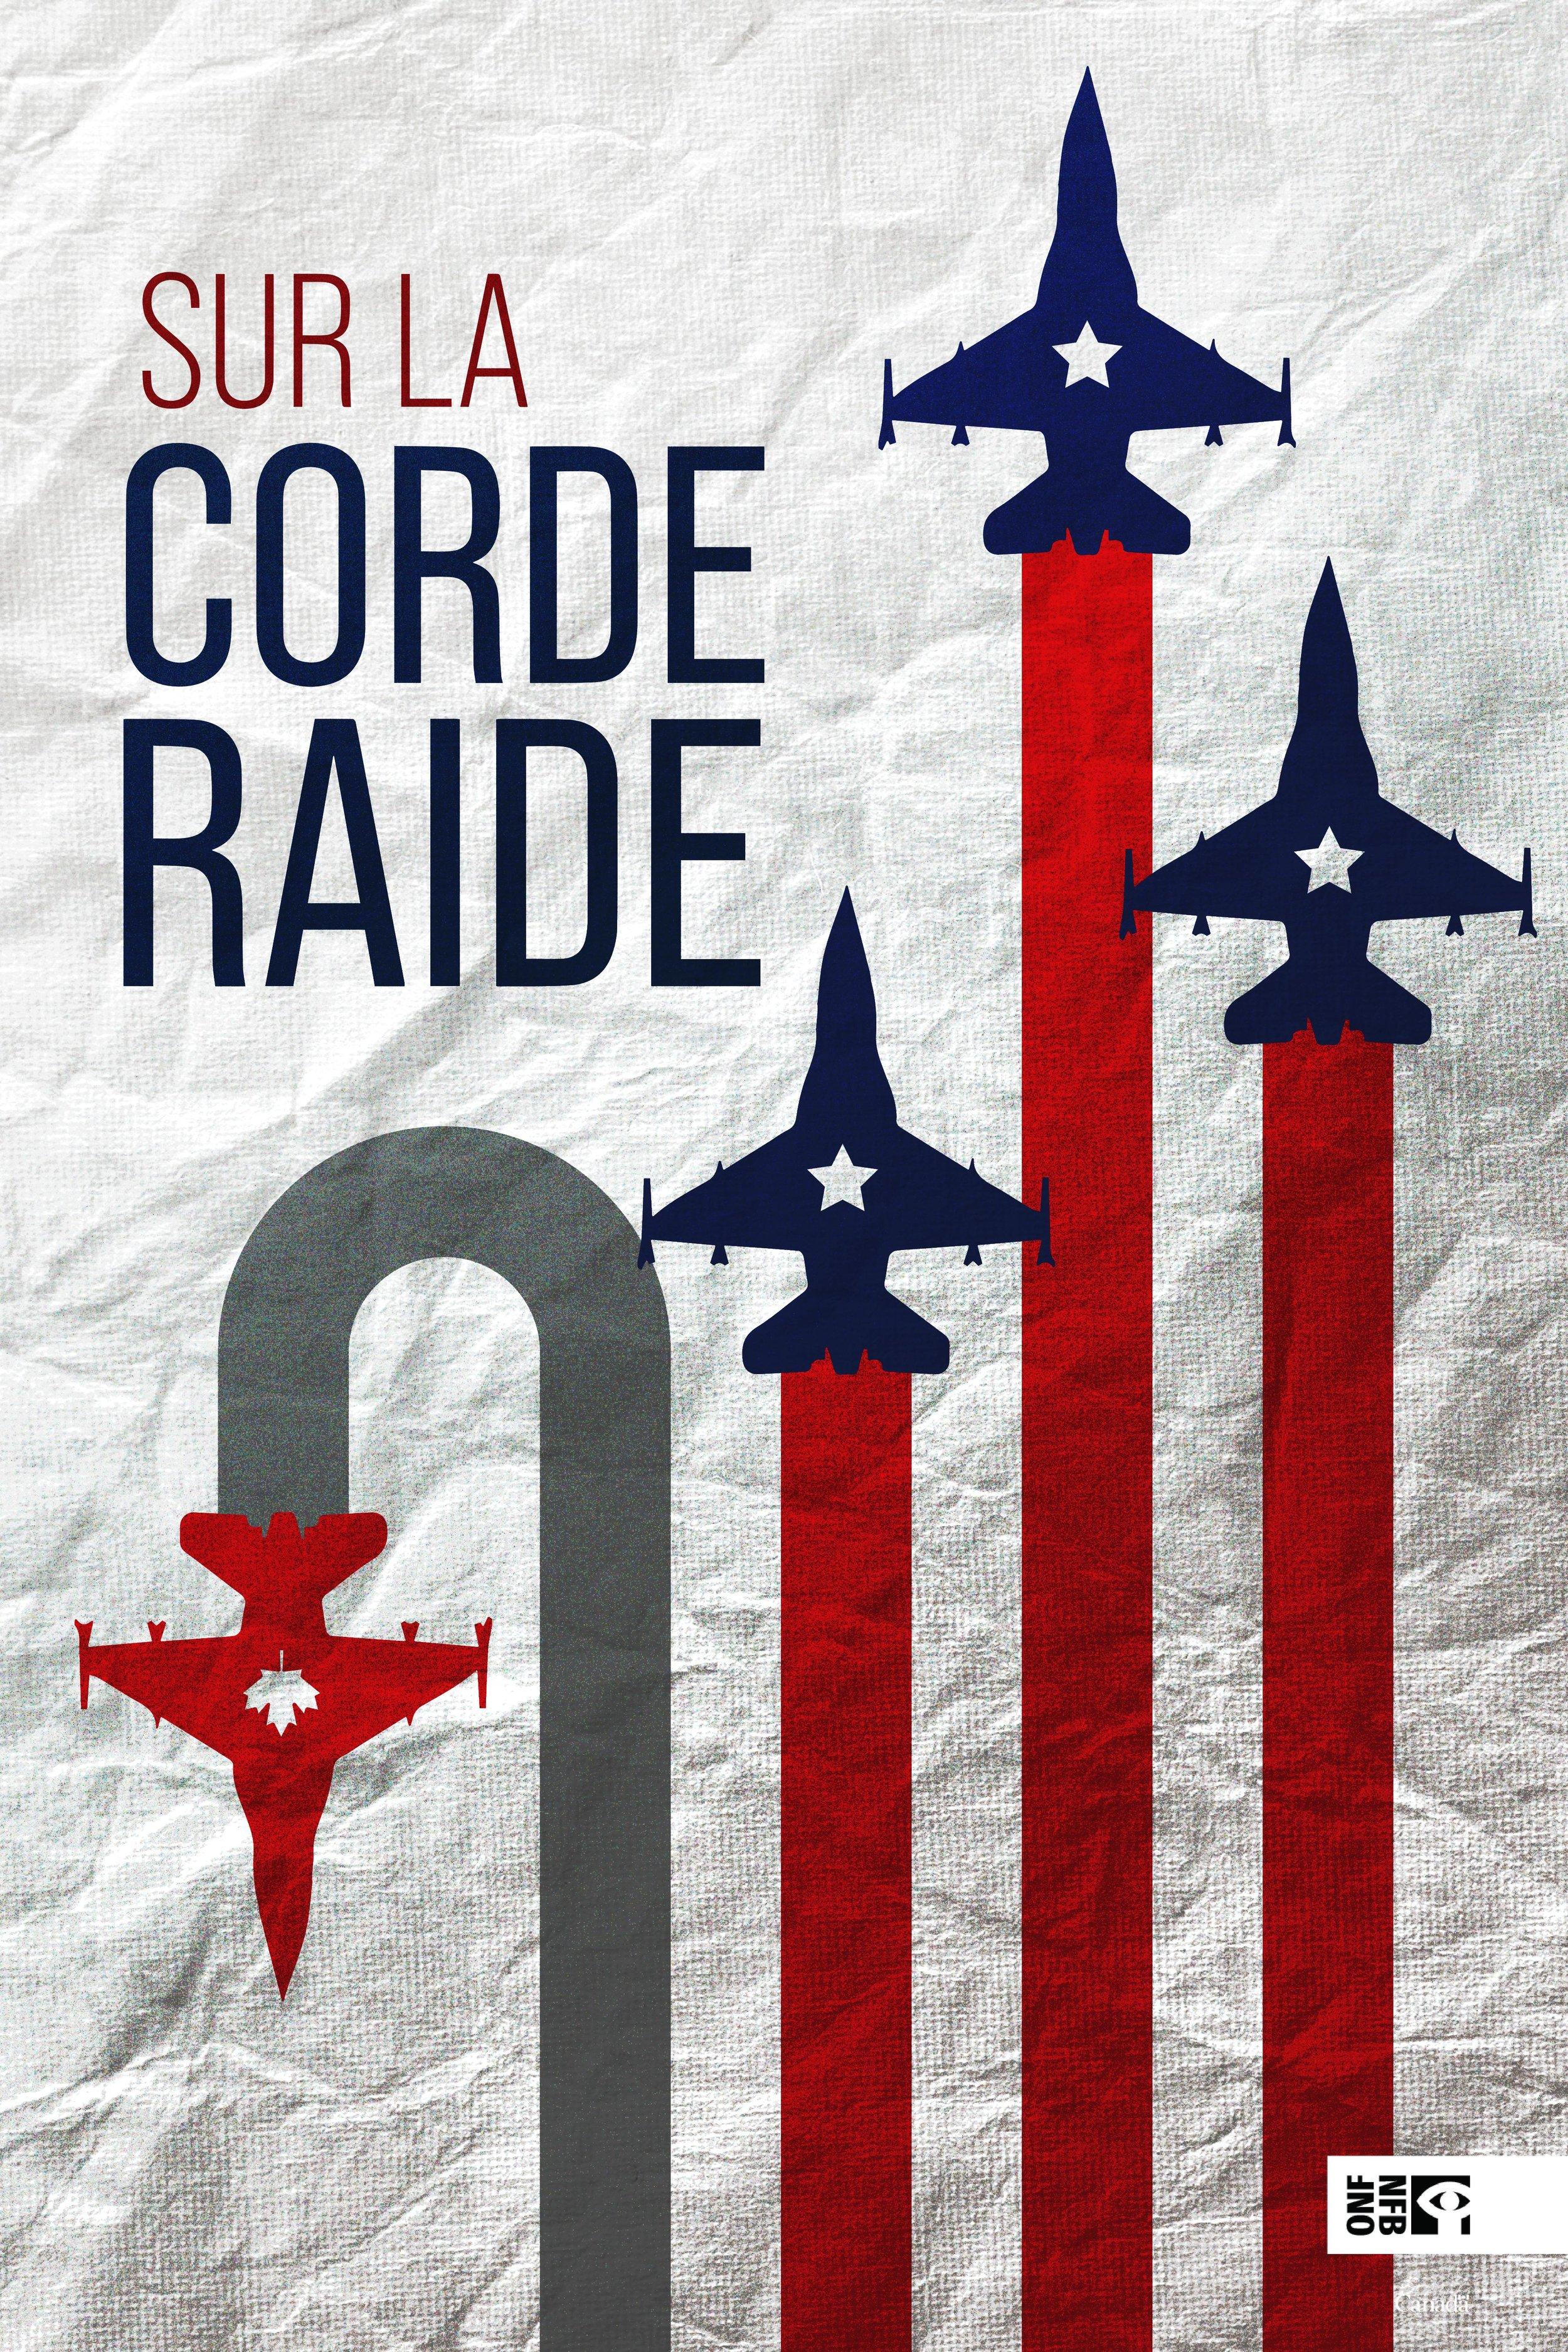 SURLACORDERAIDE-LaCamaraderie-Poster-1mars-01 (1)_00002.jpg